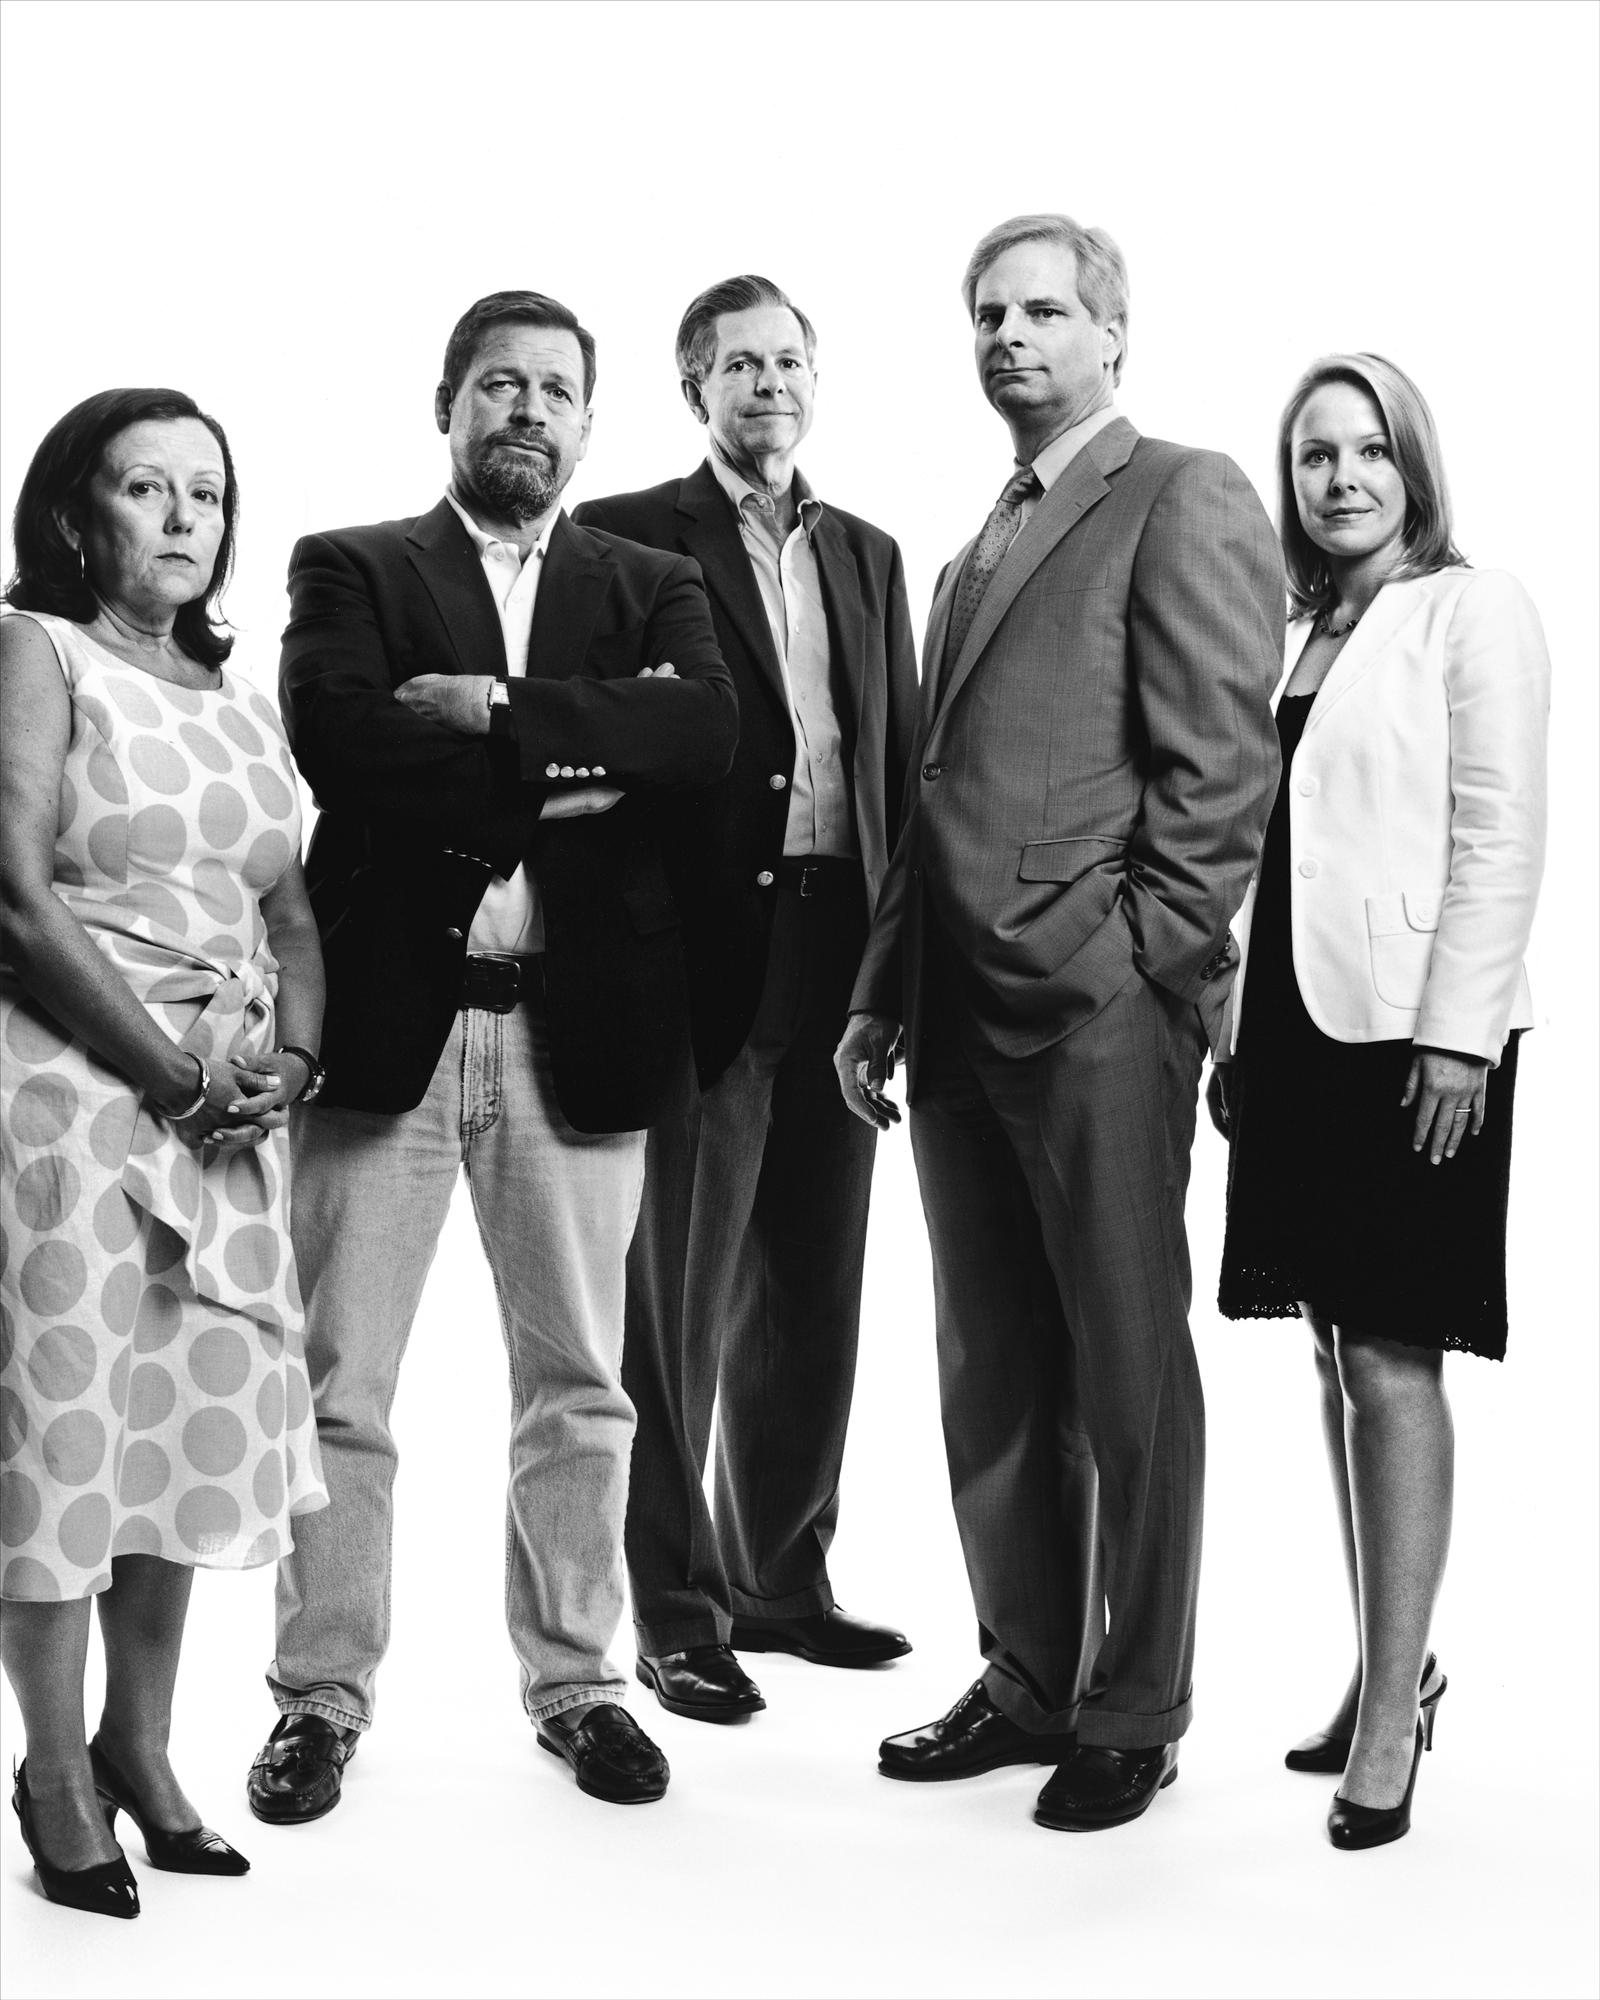 Rick Davis and members of John McCain's 2008 Presidential Campaign Team - Washington, D.C.